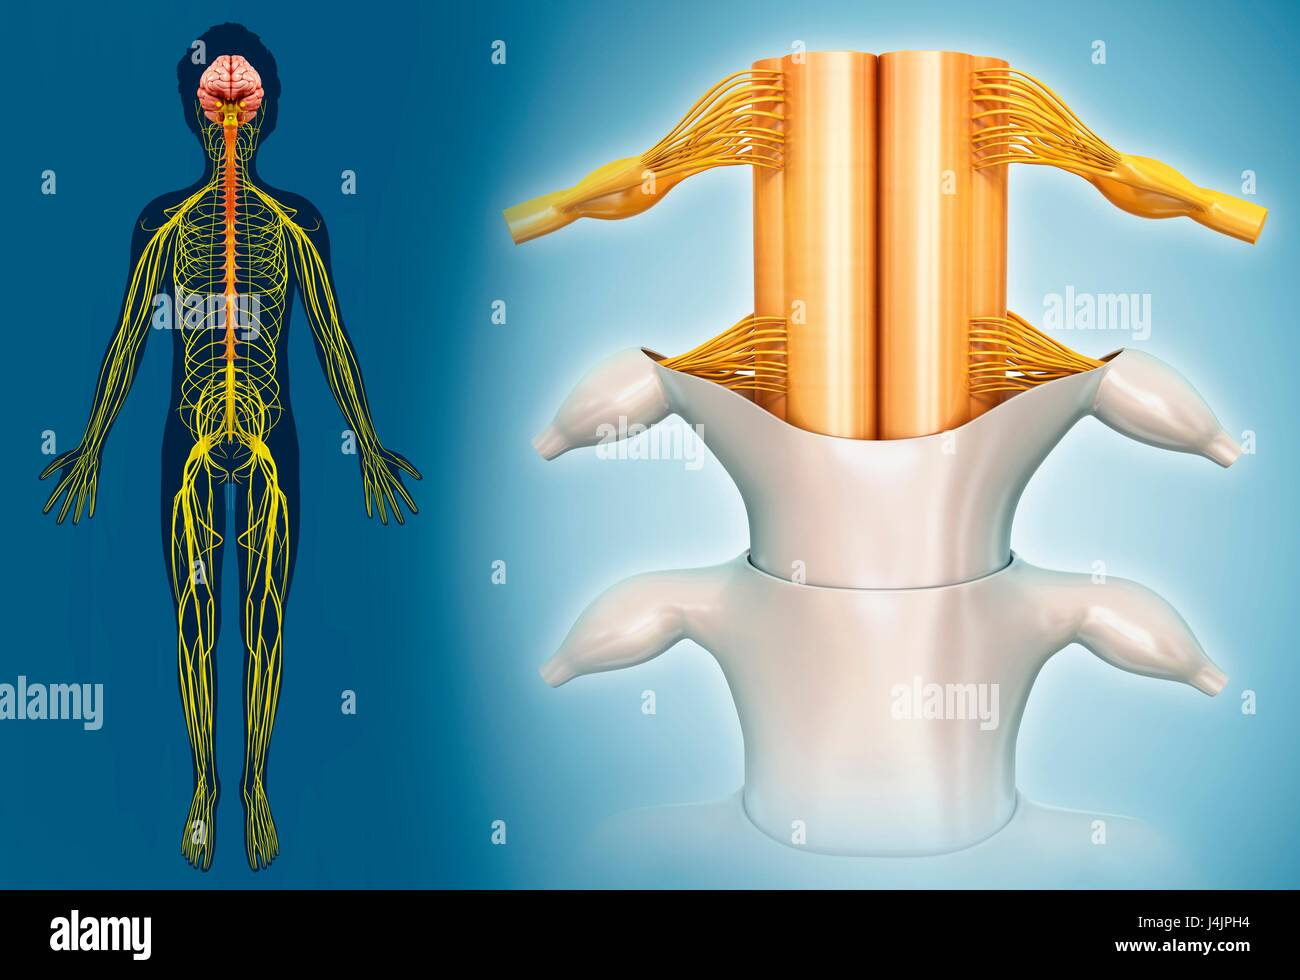 Illustration of spinal cord anatomy Stock Photo: 140554432 - Alamy